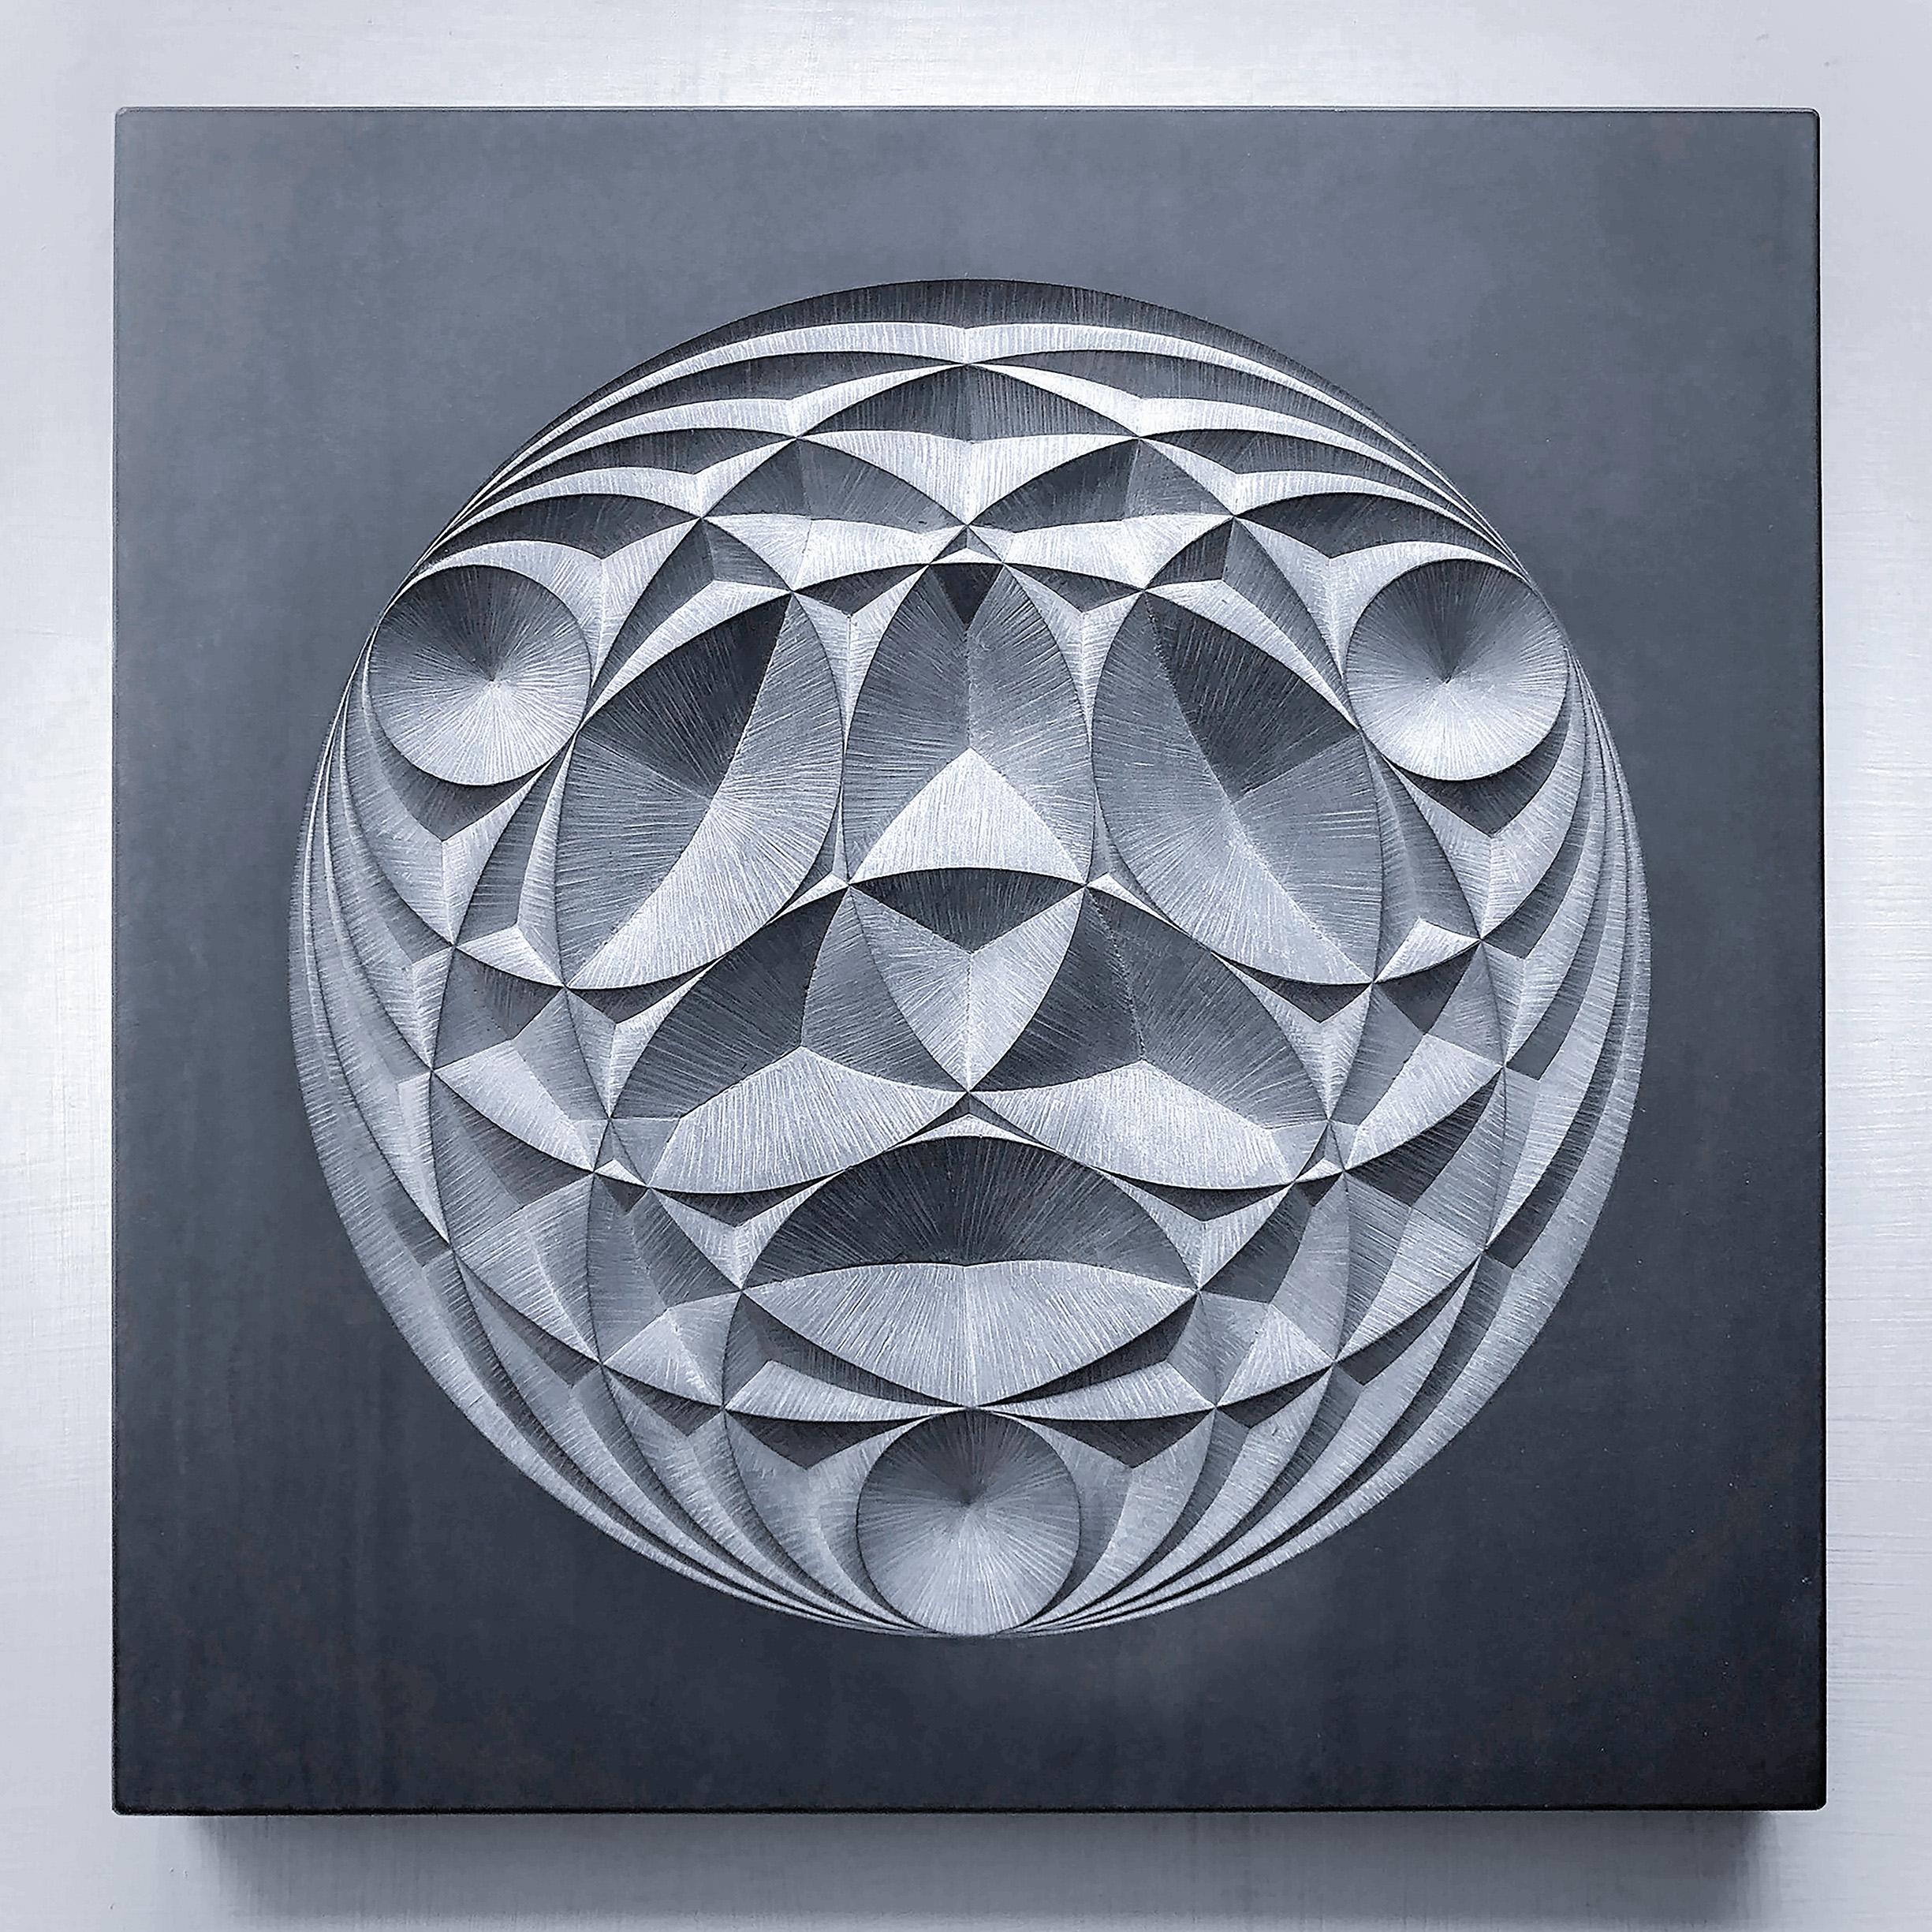 Circular geometric pattern carved into dark grey slate